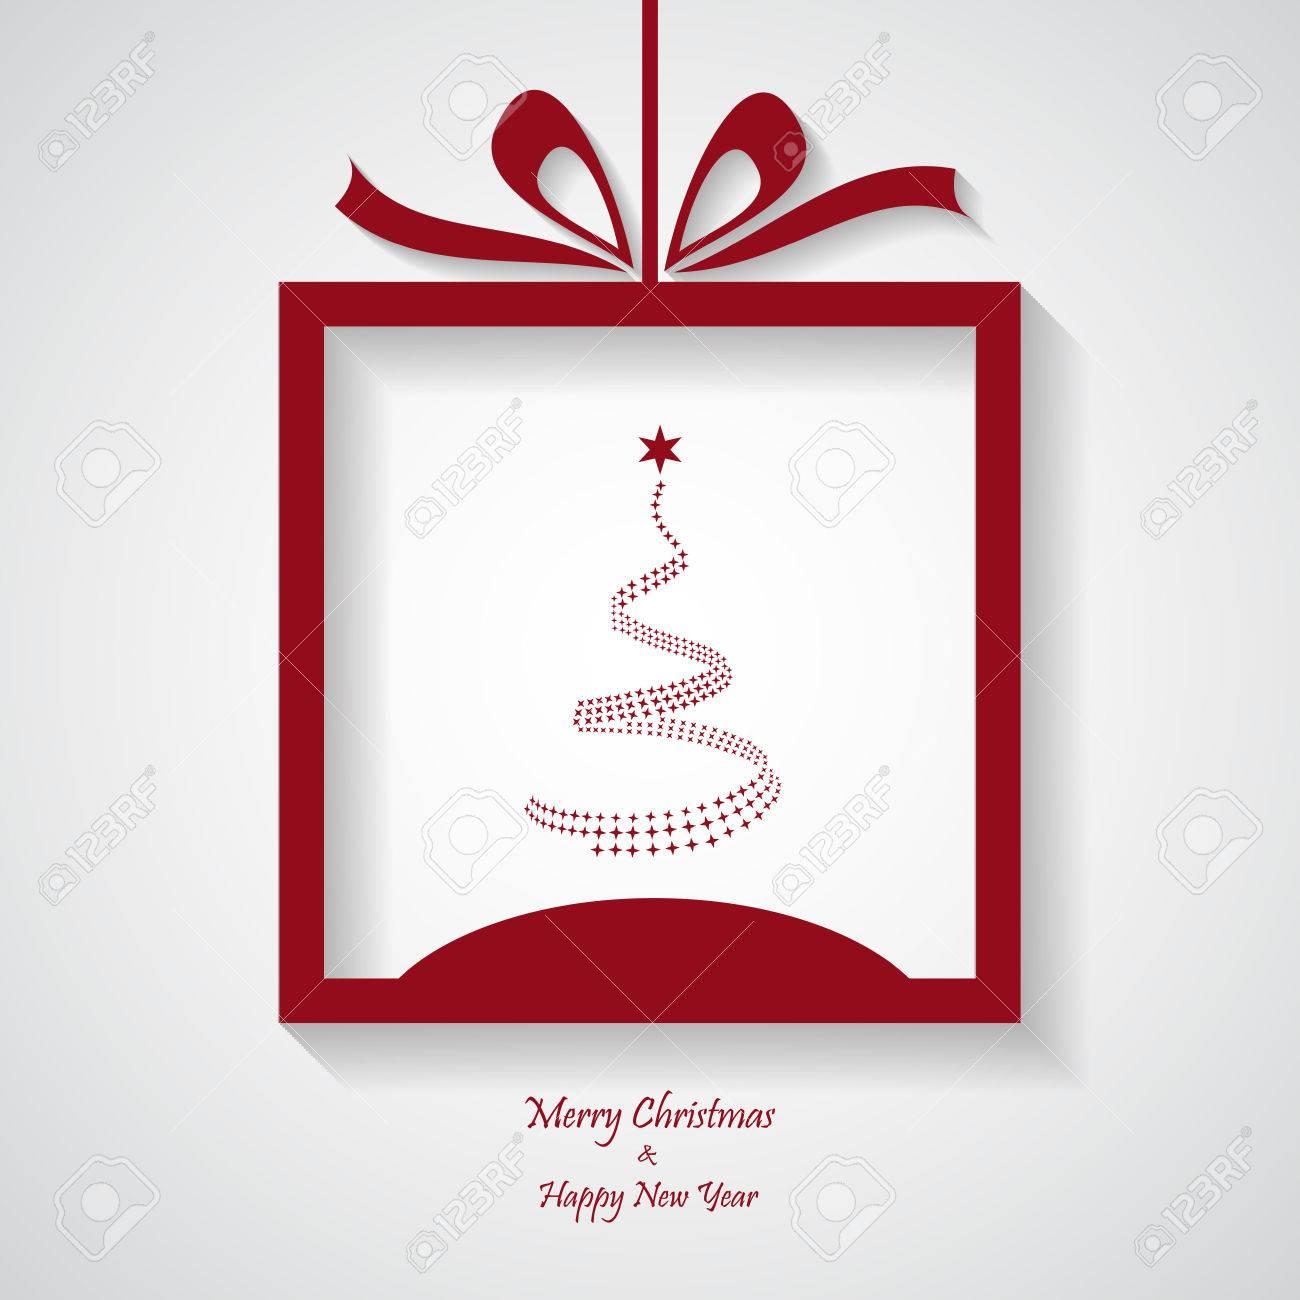 Simple Merry Christmas Card, Modern, Vector, Illustration Royalty ...